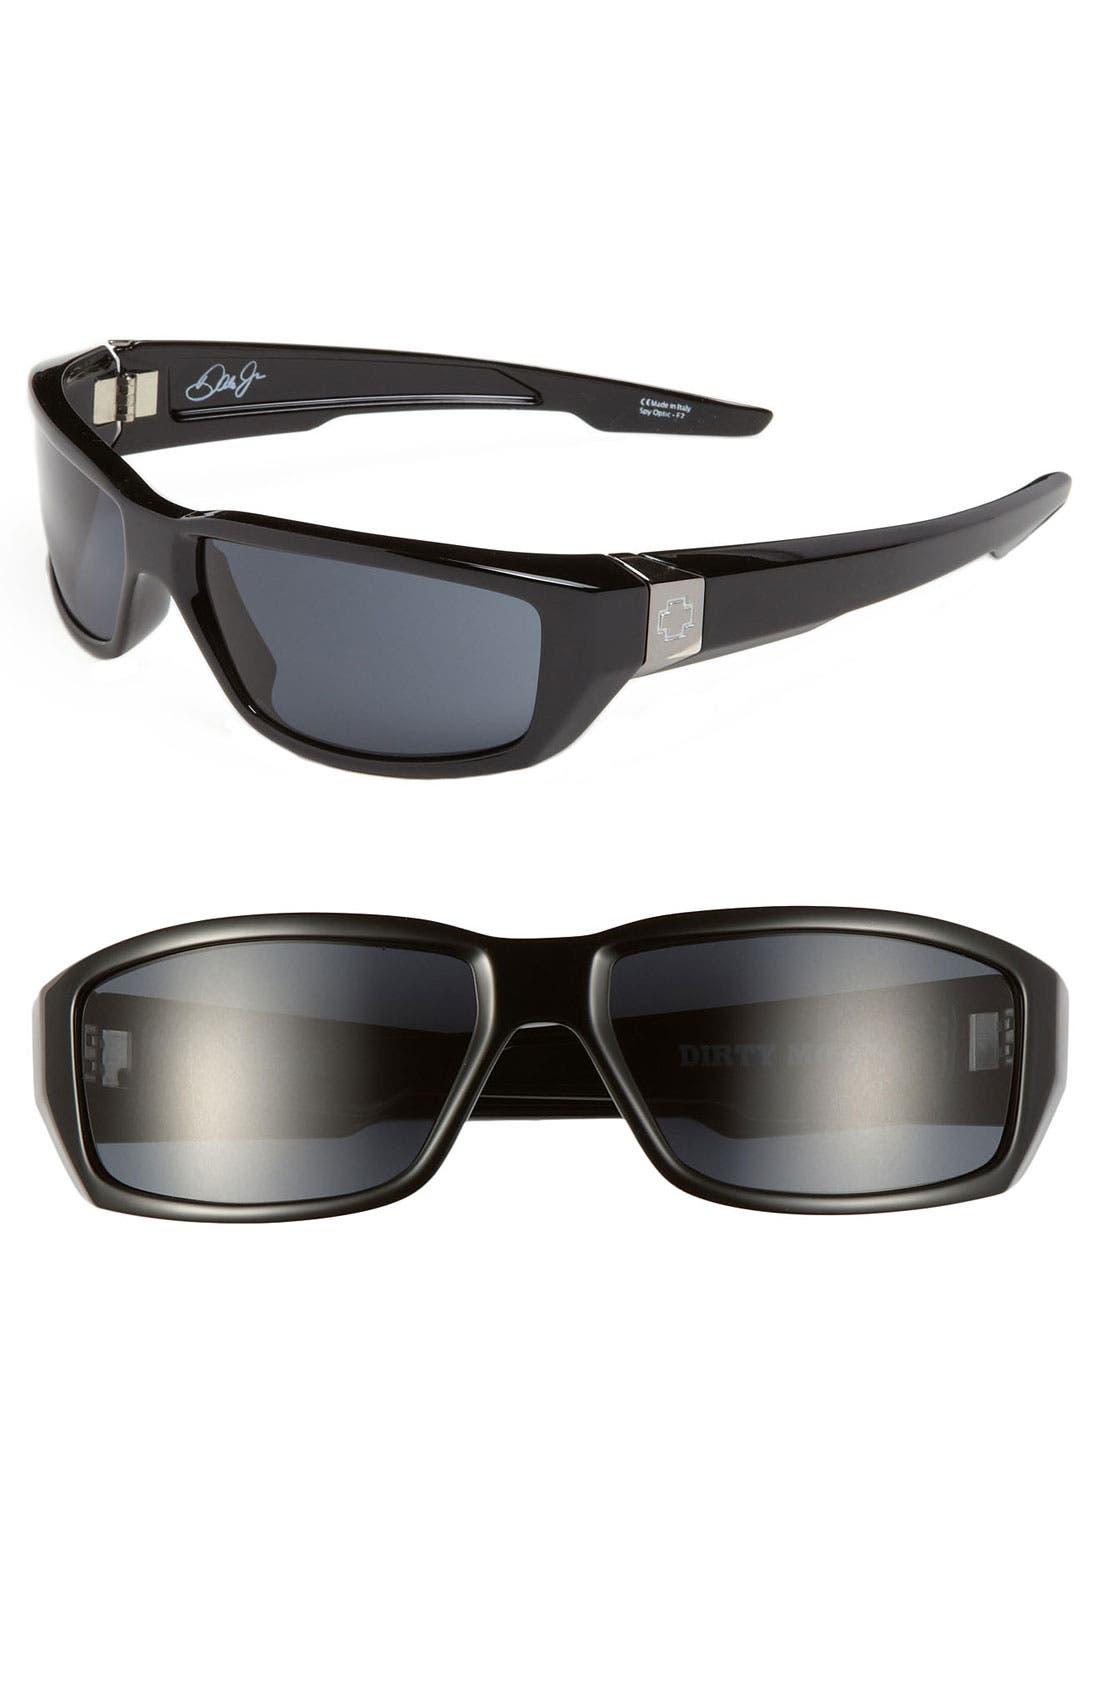 Main Image - SPY Optic 'Dale Earnhardt Jr. - Dirty Mo' 59mm Sunglasses